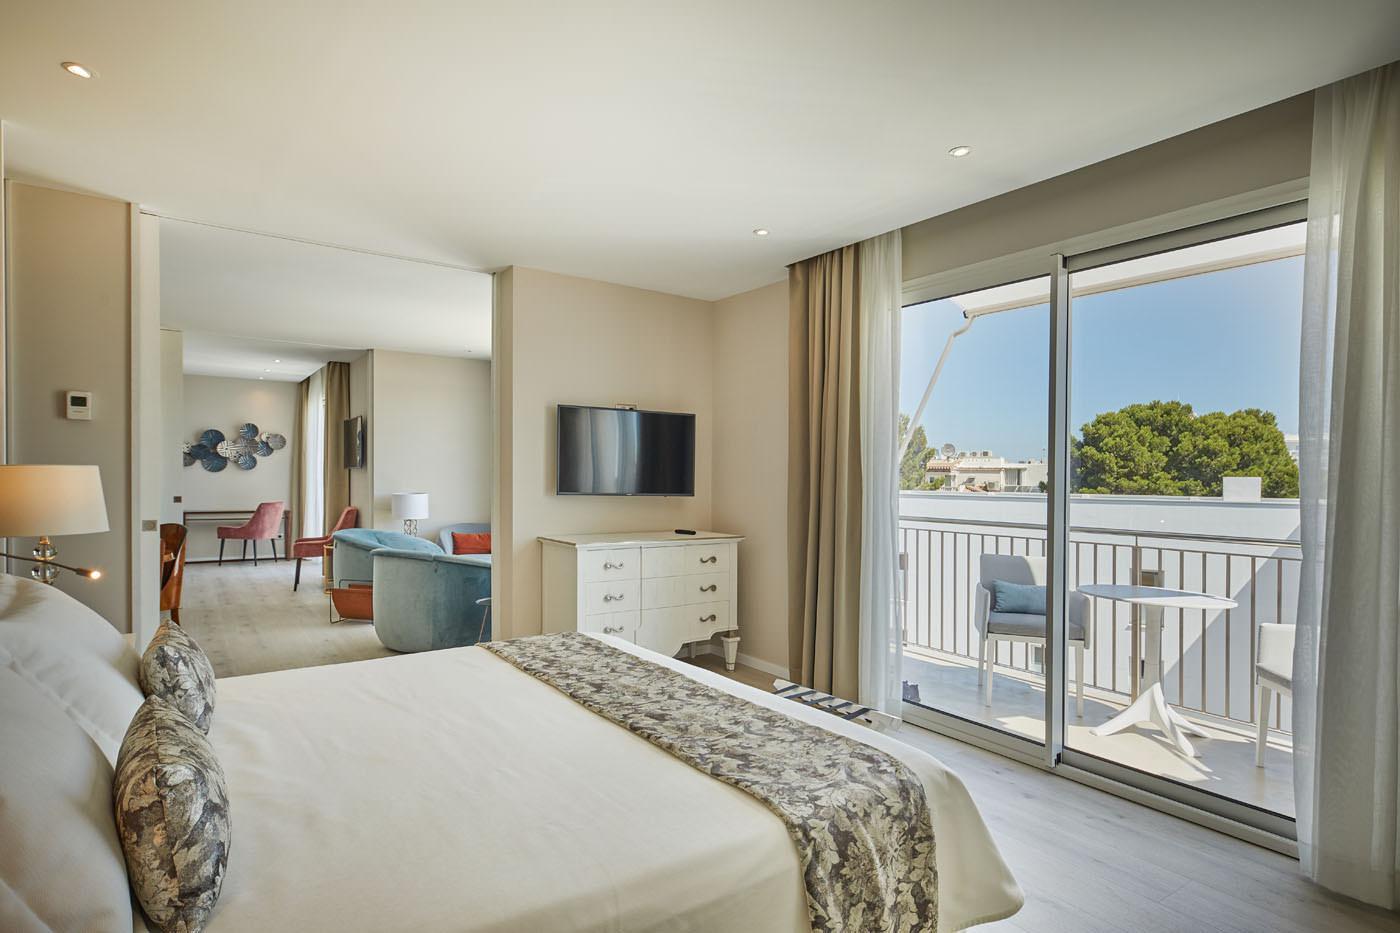 Hotel Boutique El Coto Colonia de Sant Jordi Mallorca